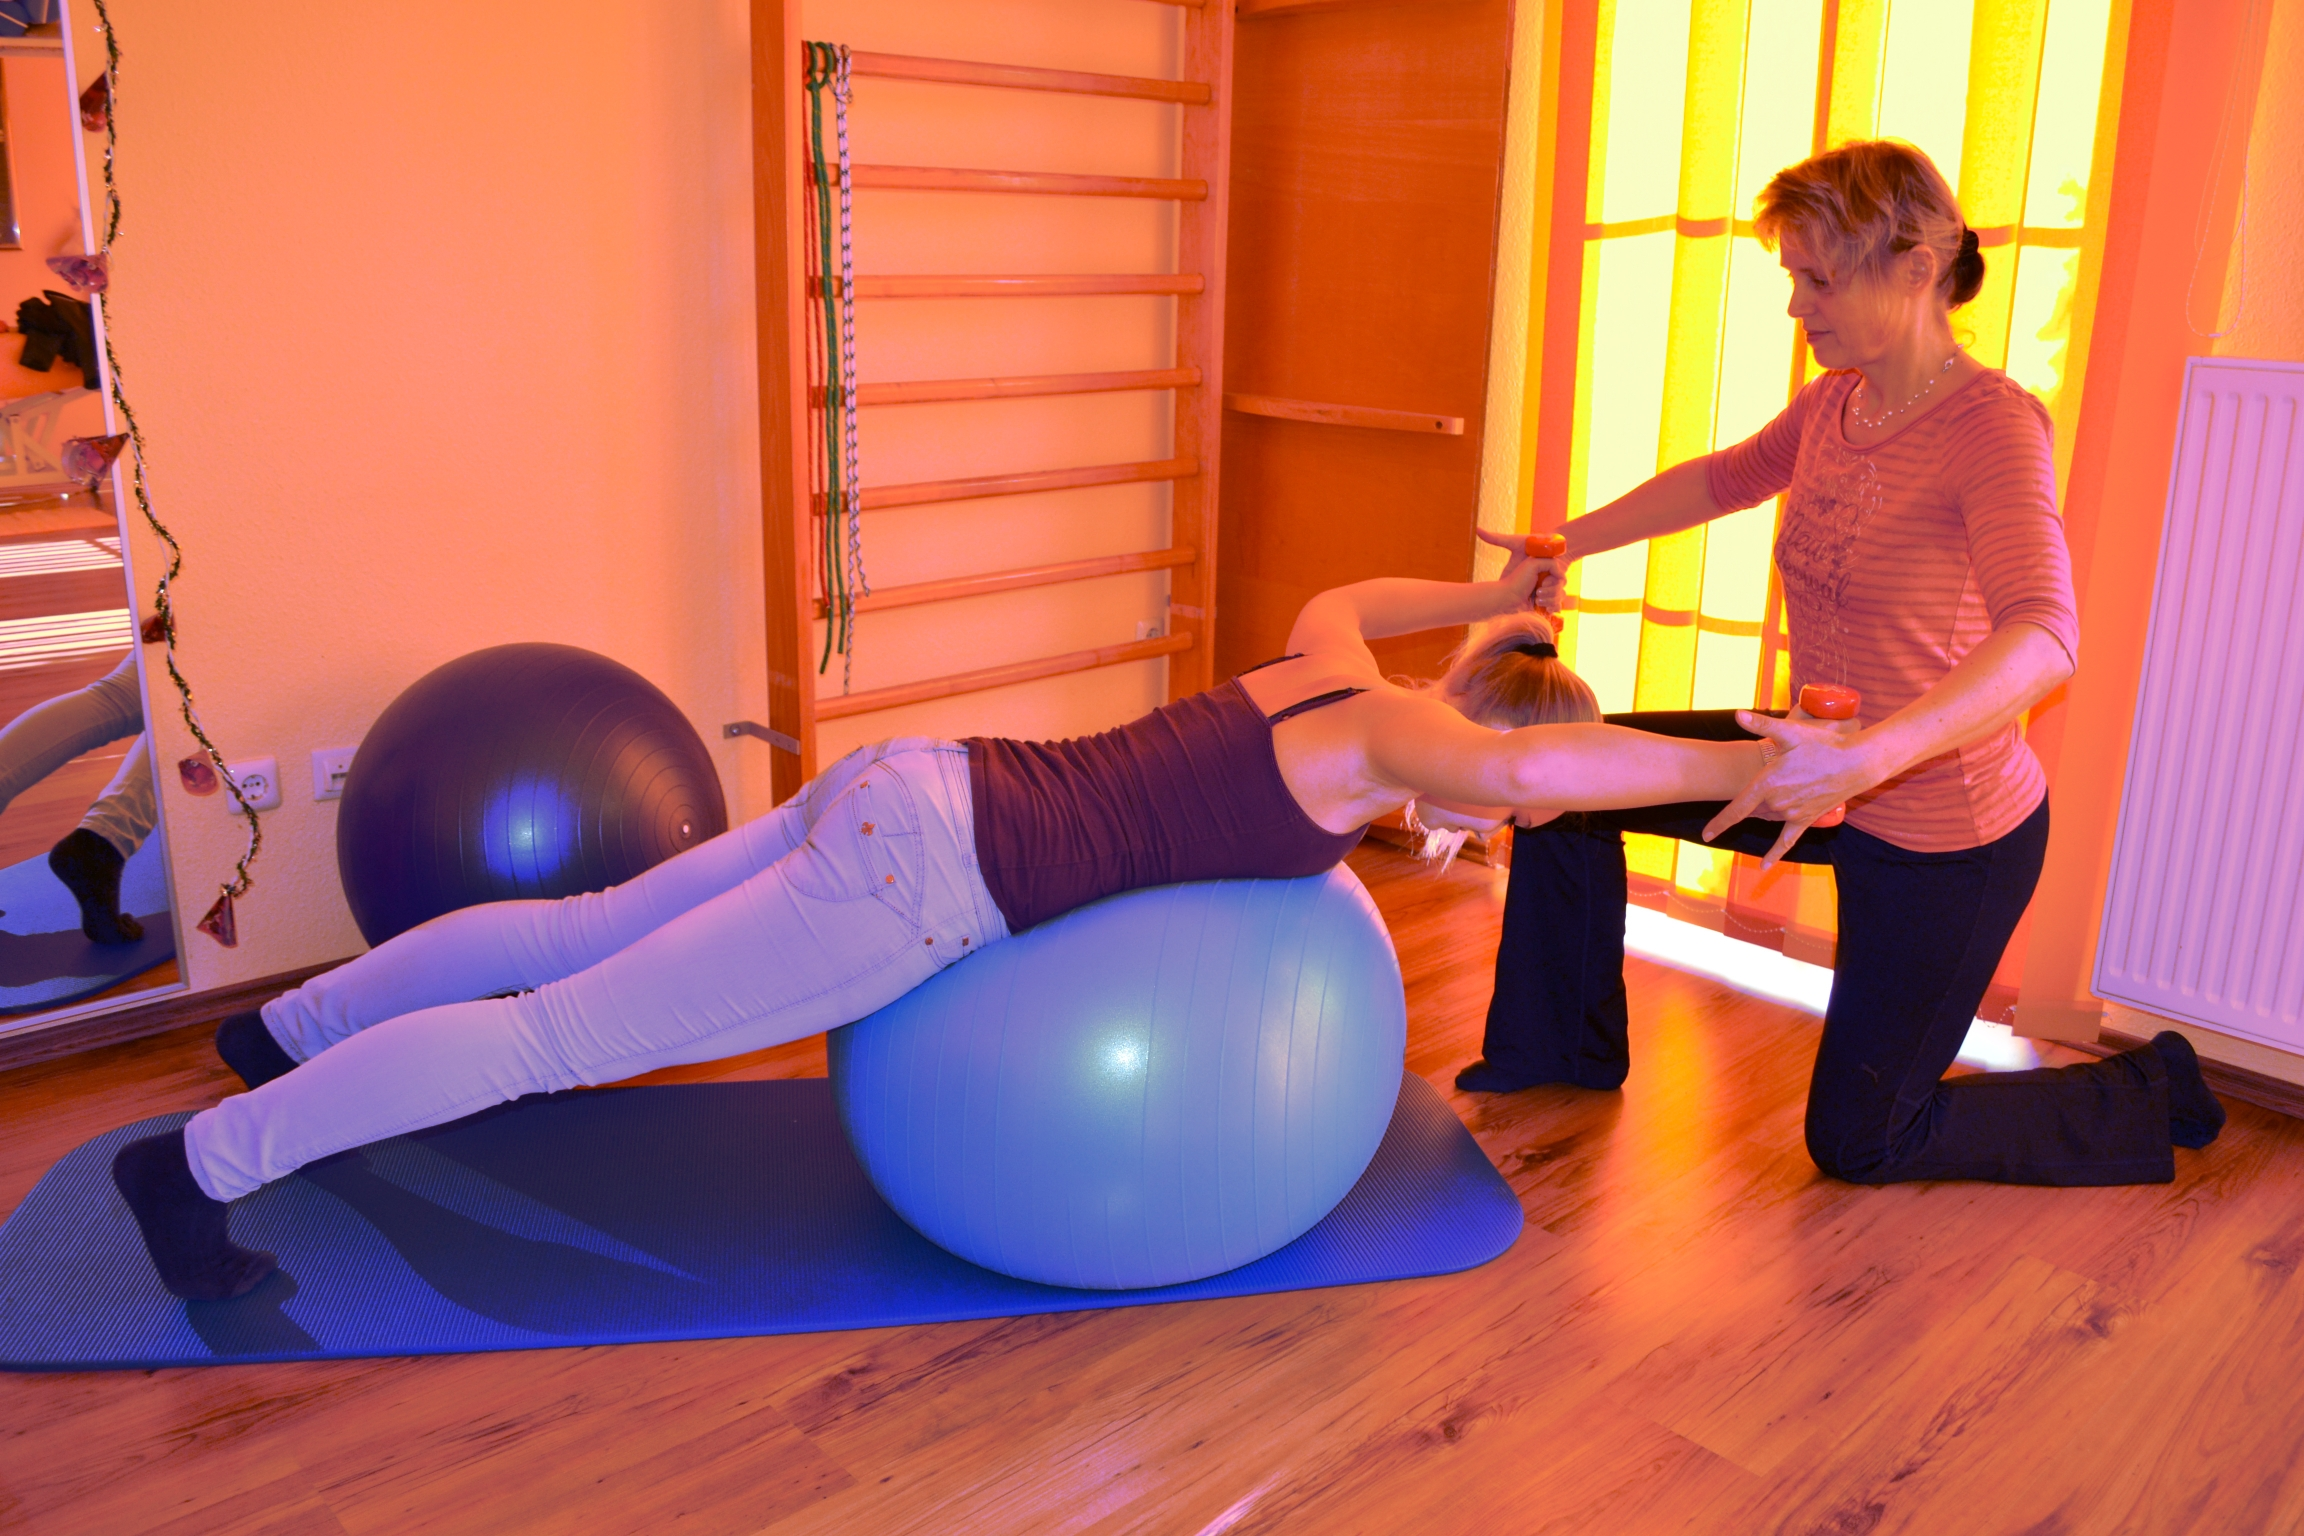 physiotherapie monika wurow praxis f r physiotherapie und wellness. Black Bedroom Furniture Sets. Home Design Ideas